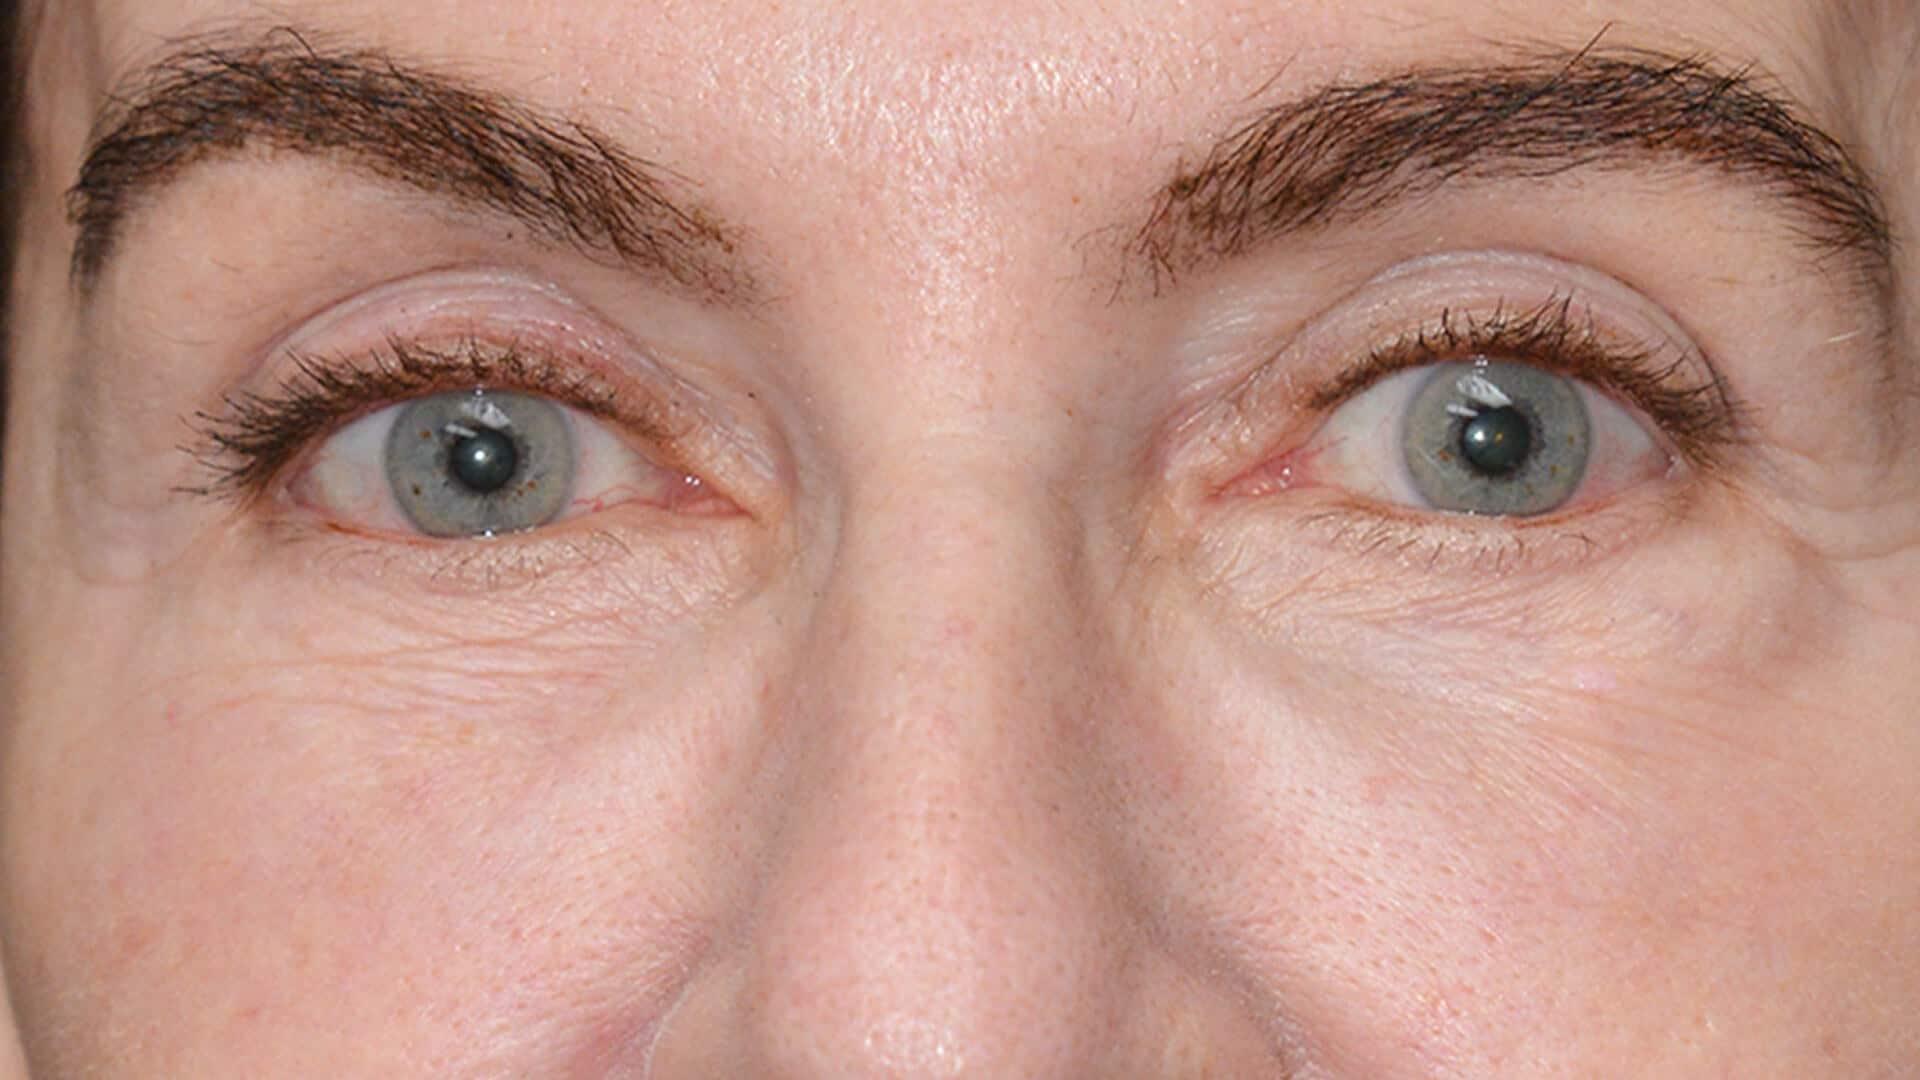 Case 35695 LowLid Blepharoplasty Before